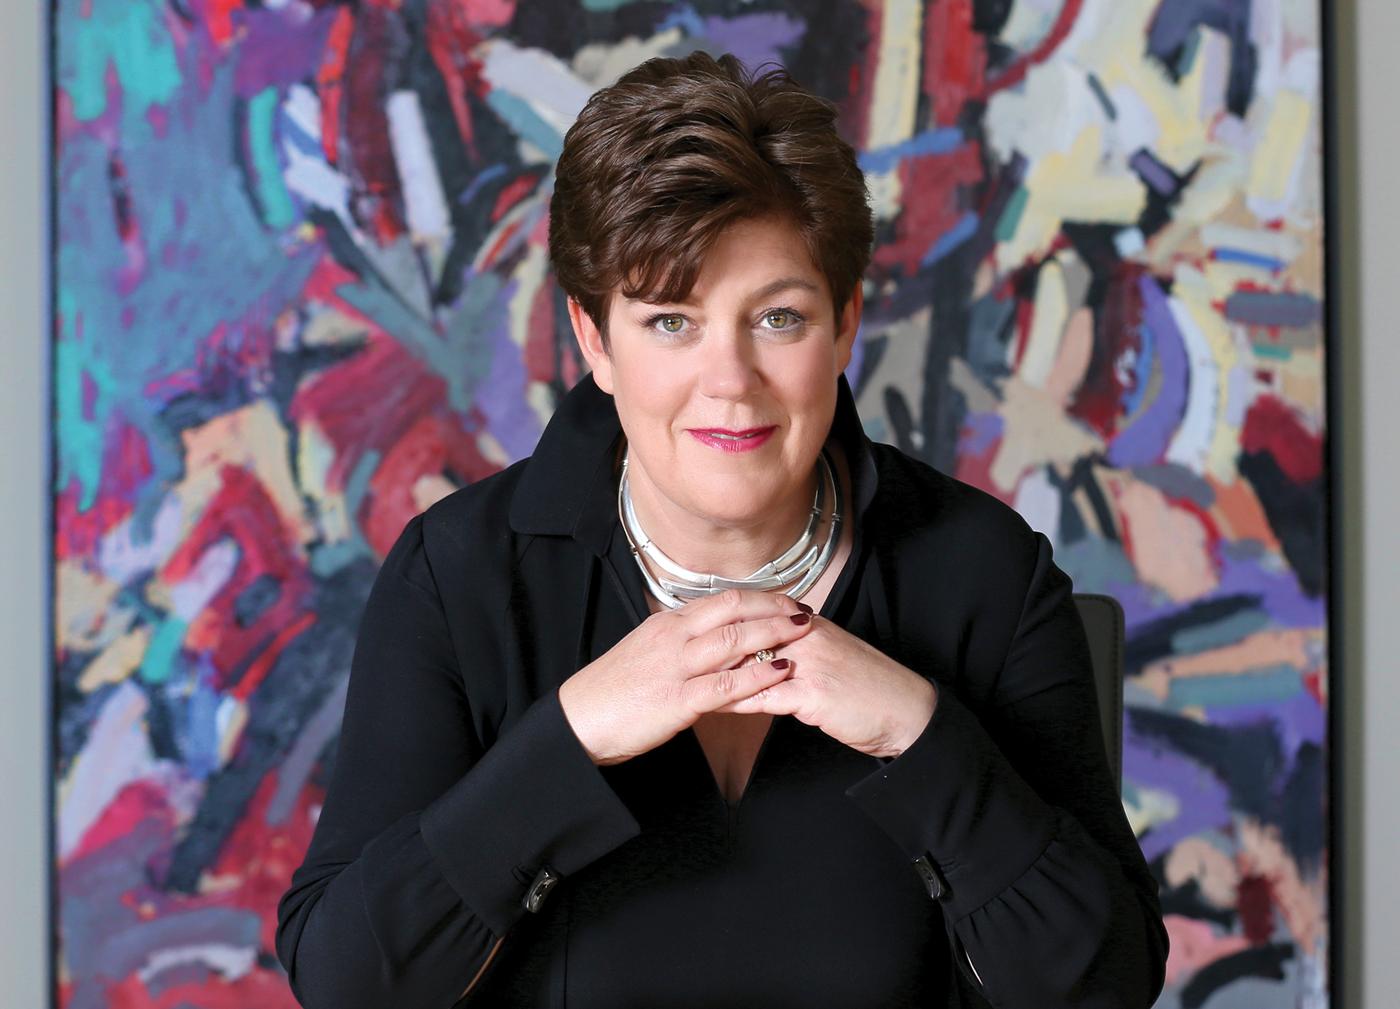 Professor Victoria Medvec at Northwestern University's Kellogg School of Management.    Handout/via REUTERS